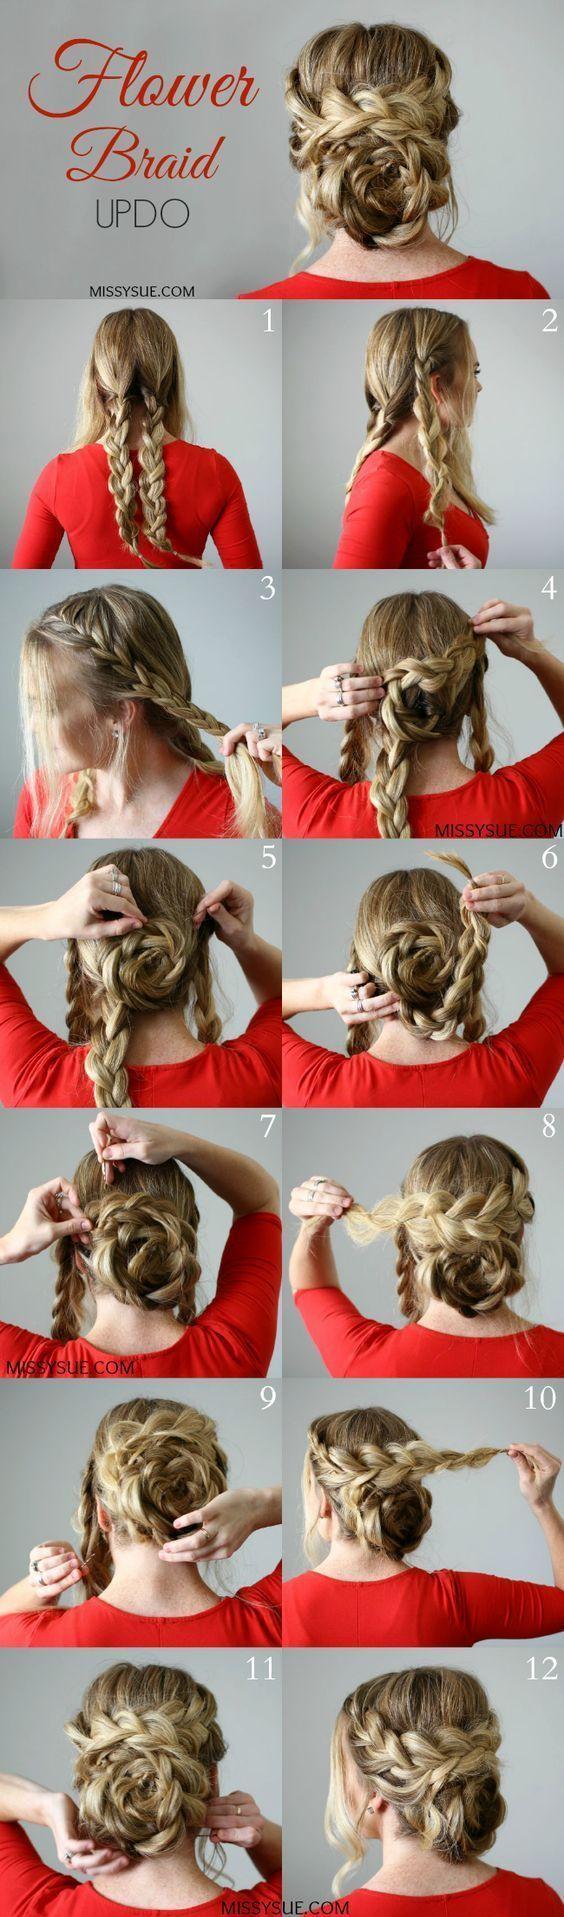 Flower braid updo tutorial himisspuffeasydiy